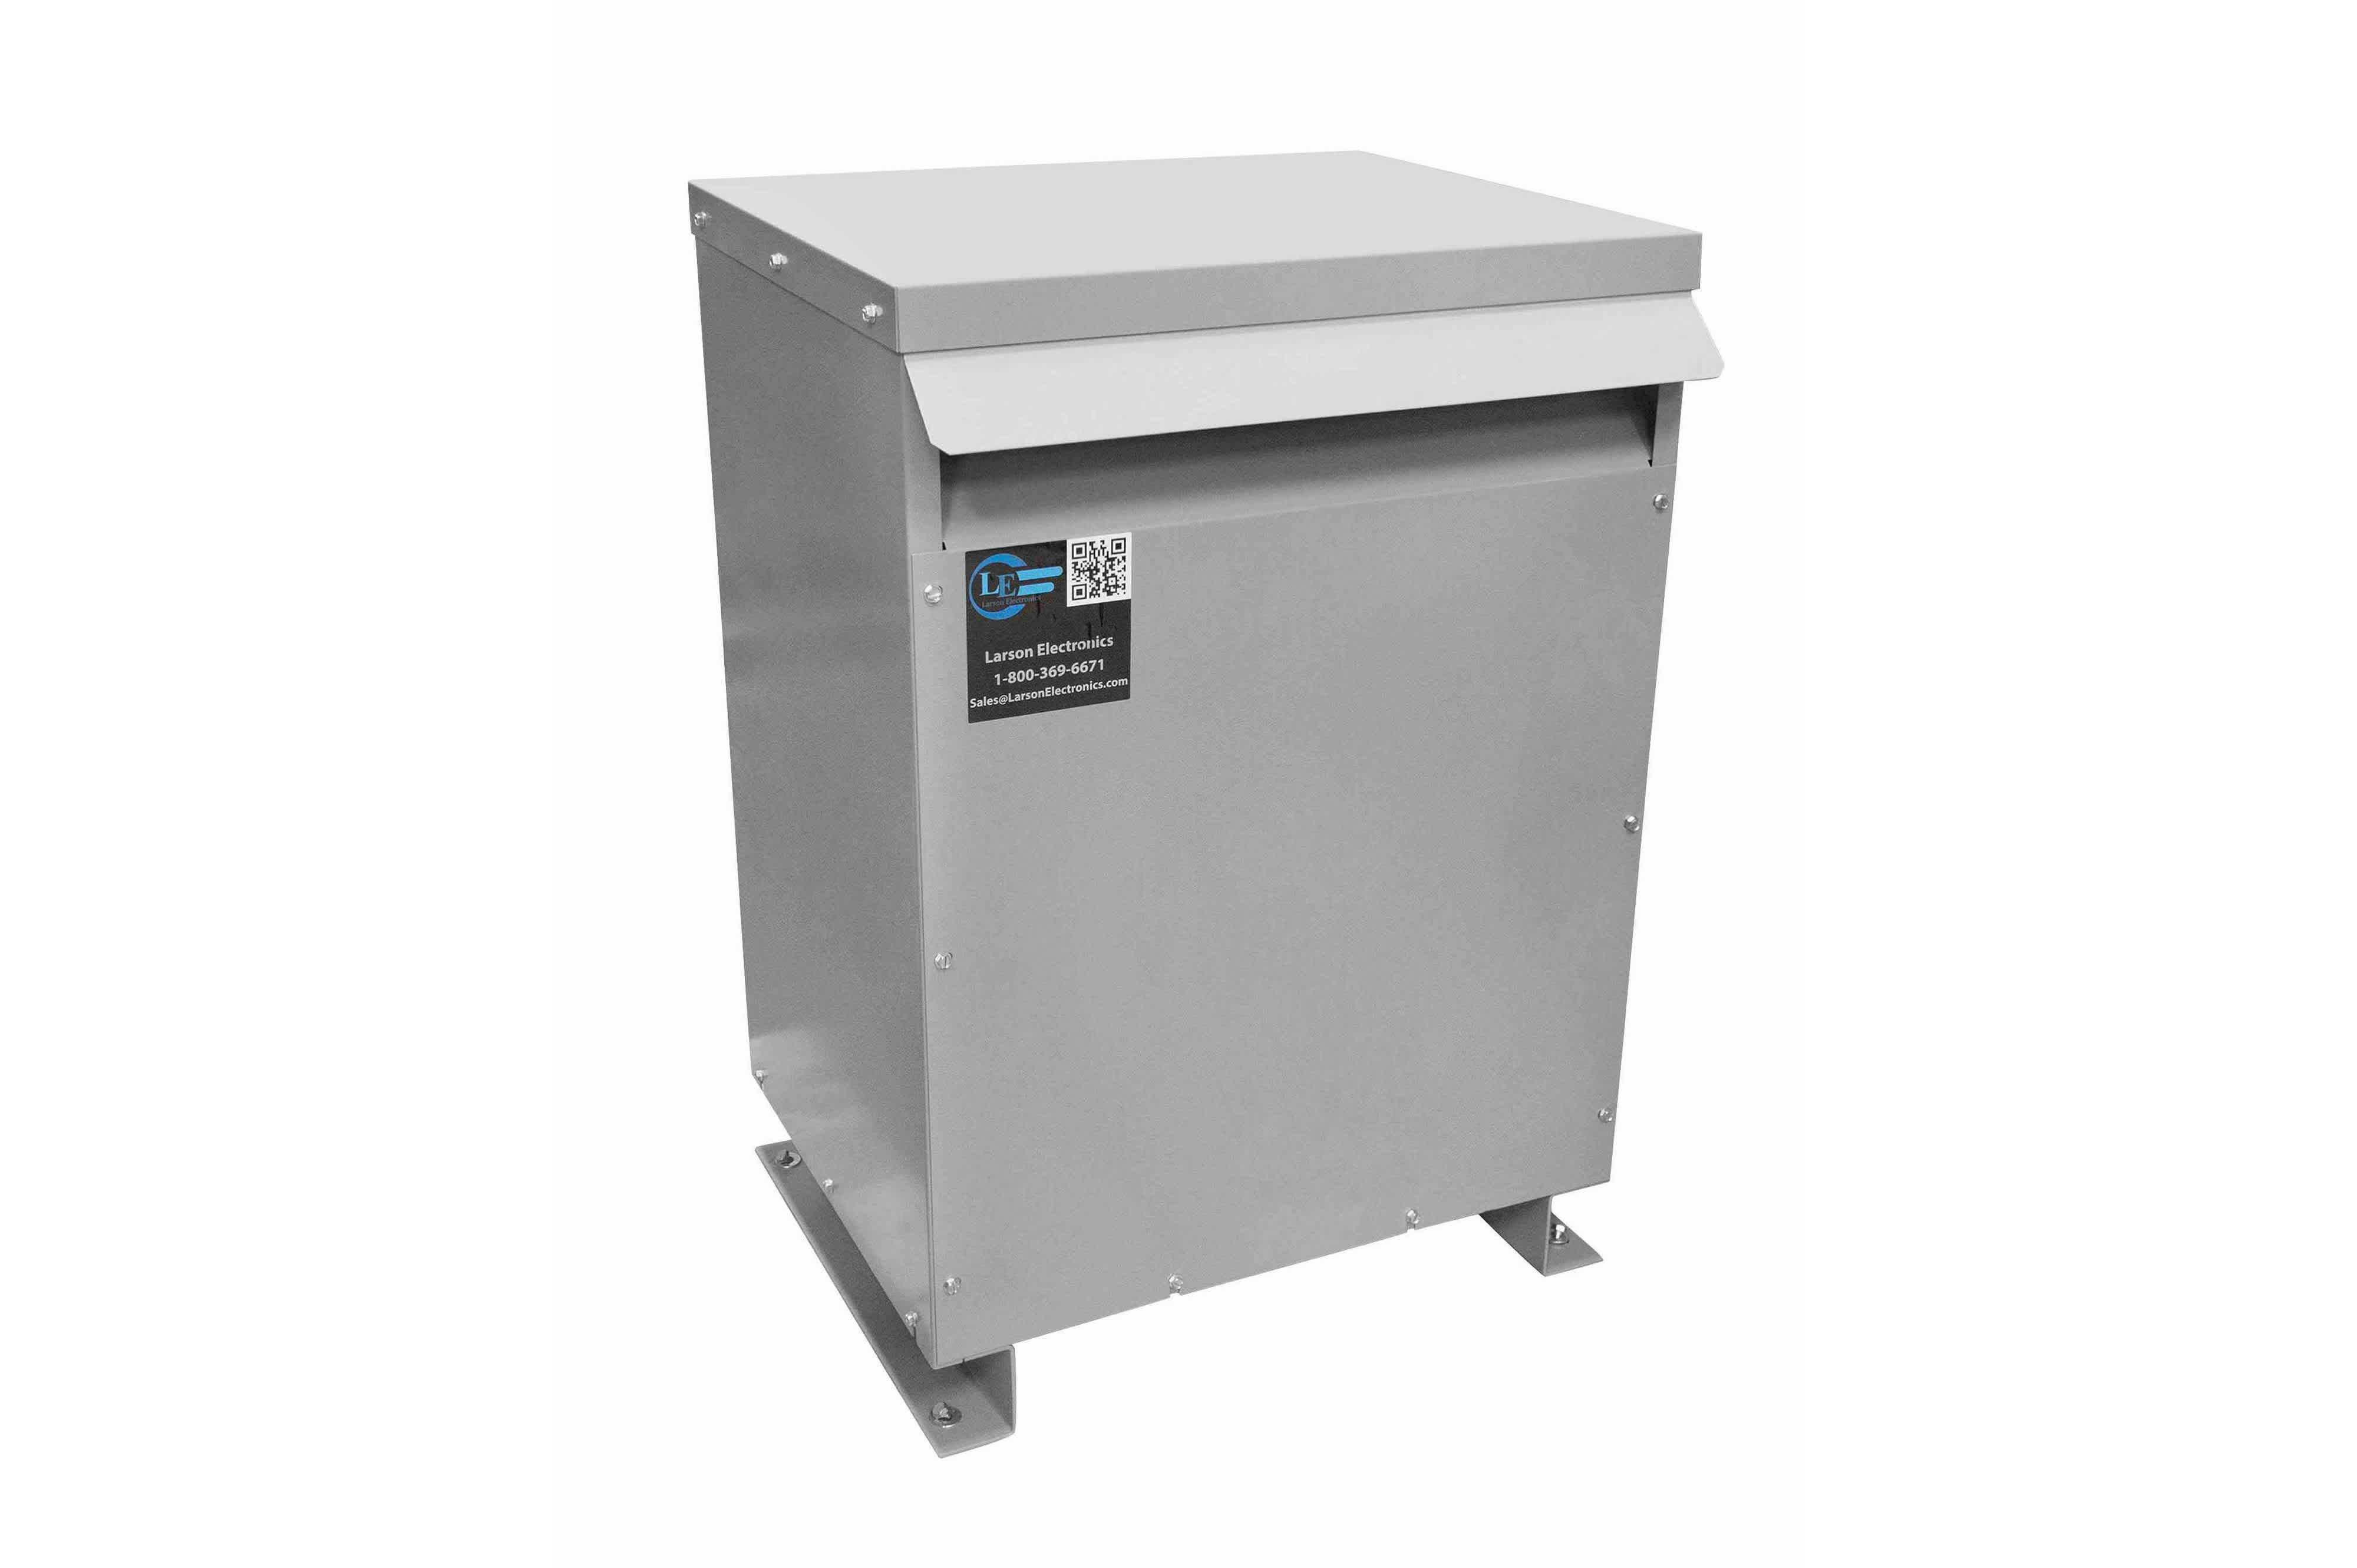 125 kVA 3PH Isolation Transformer, 220V Wye Primary, 208V Delta Secondary, N3R, Ventilated, 60 Hz